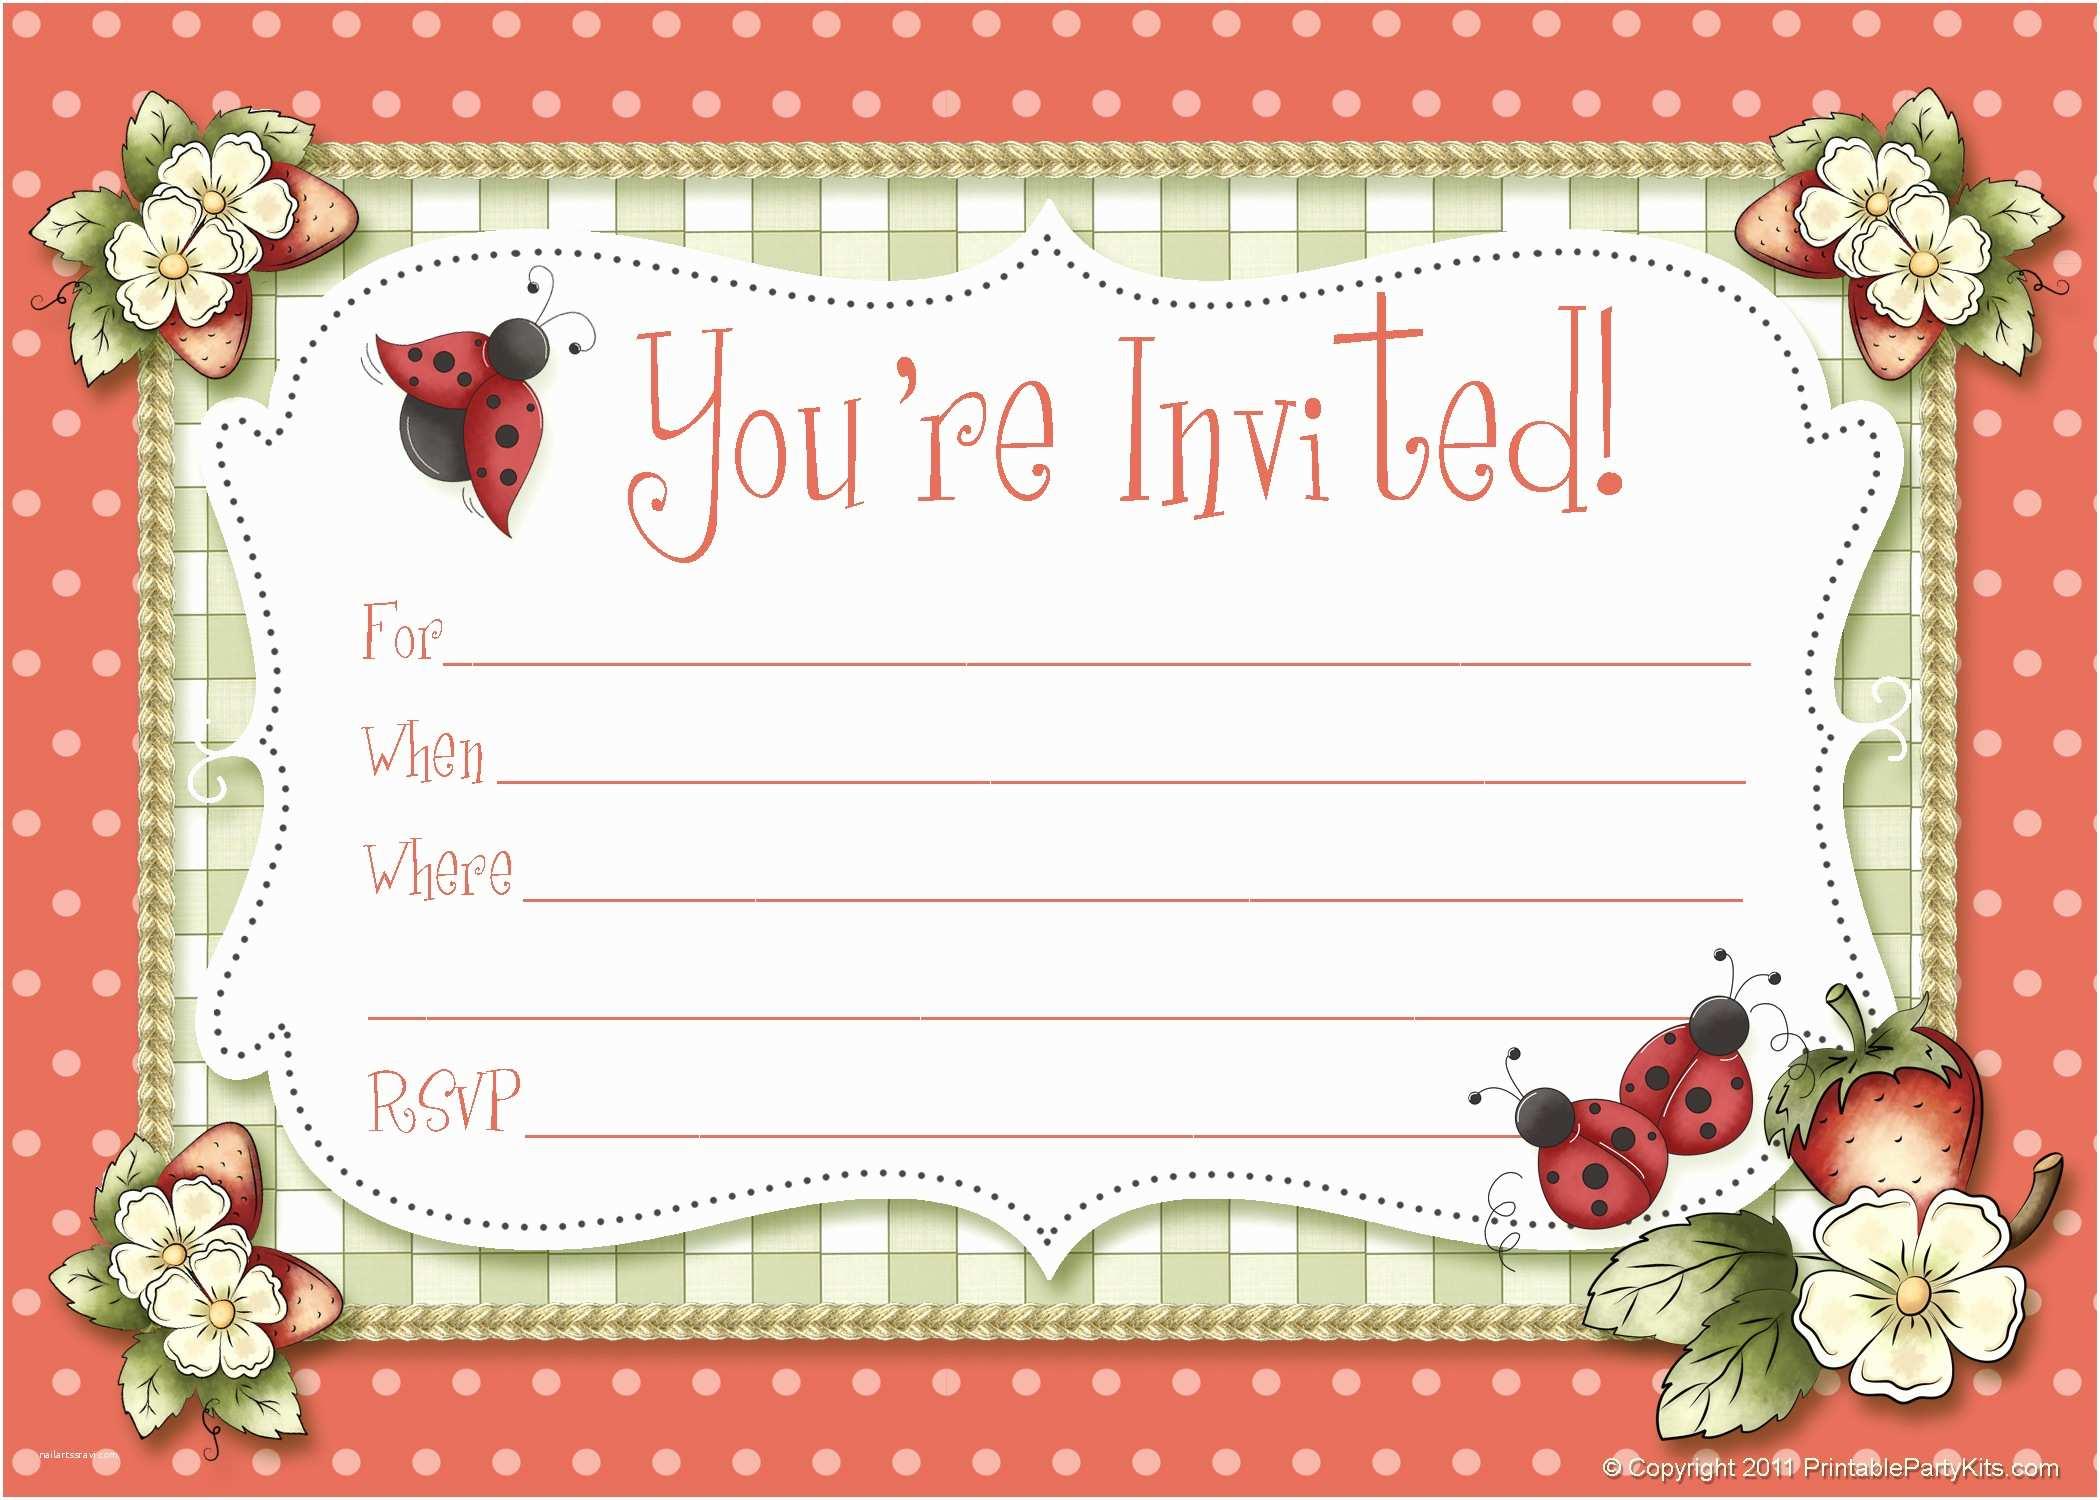 Online Party Invitations Line Party Invitations